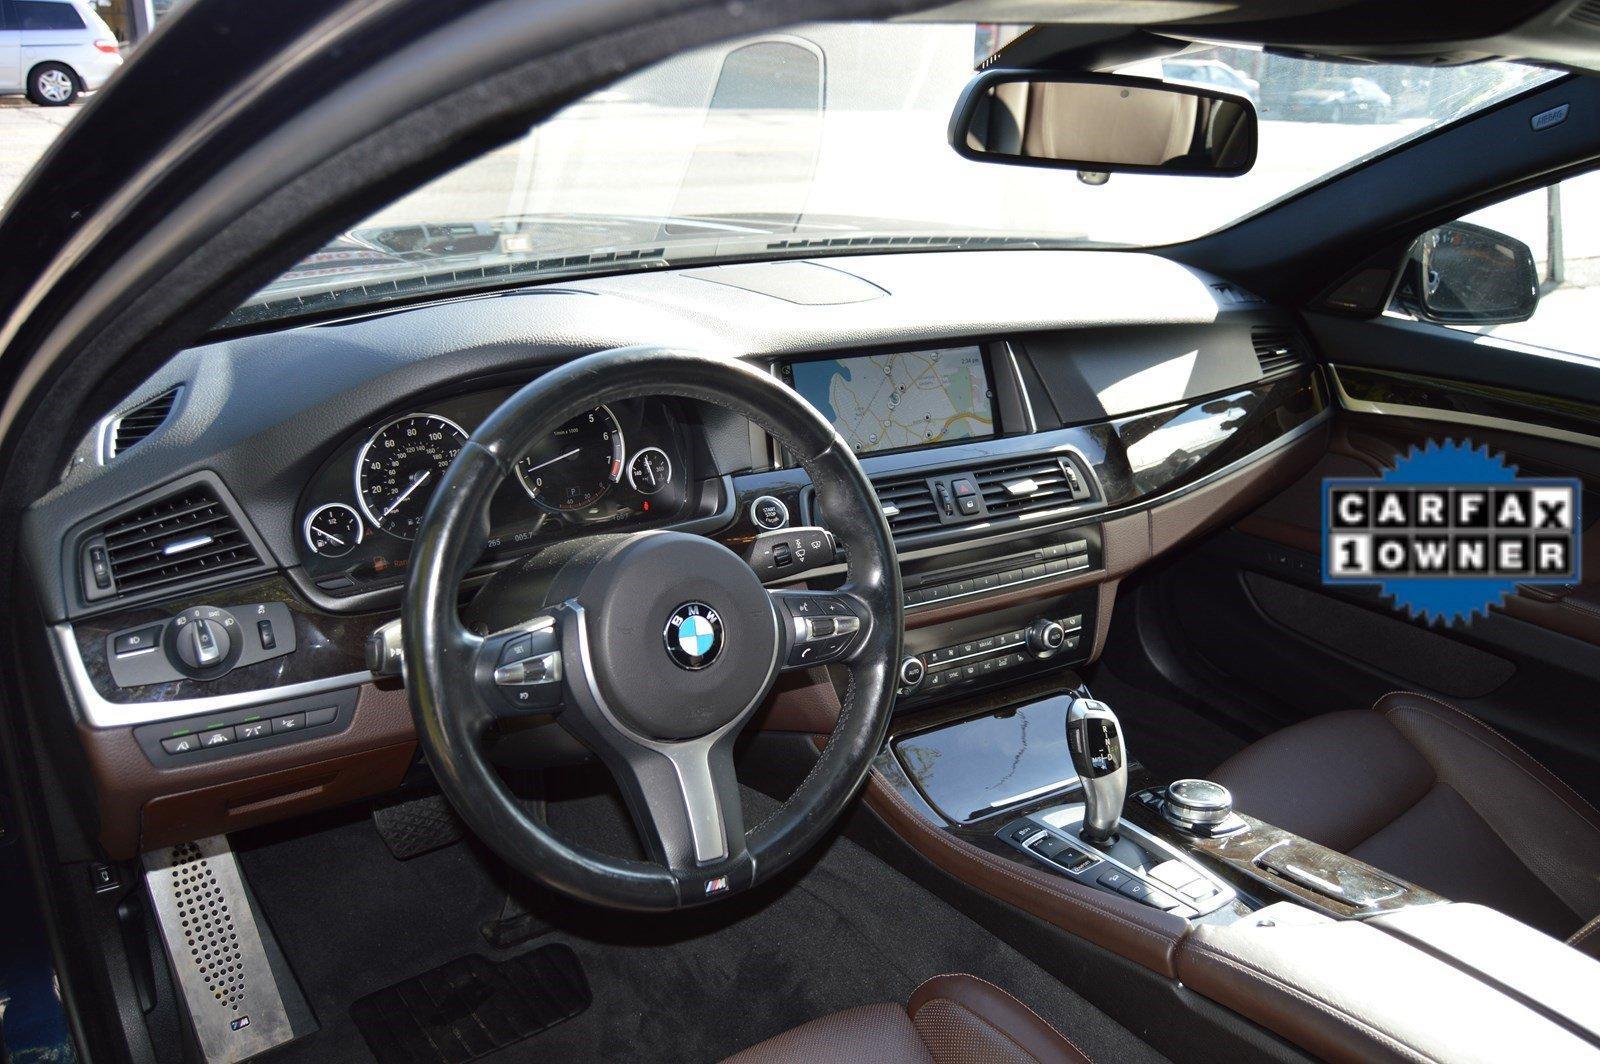 2014 bmw 5 series 535i xdrive m sport stock 9486 for sale near great neck ny ny bmw dealer 2014 bmw 5 series 535i xdrive m sport